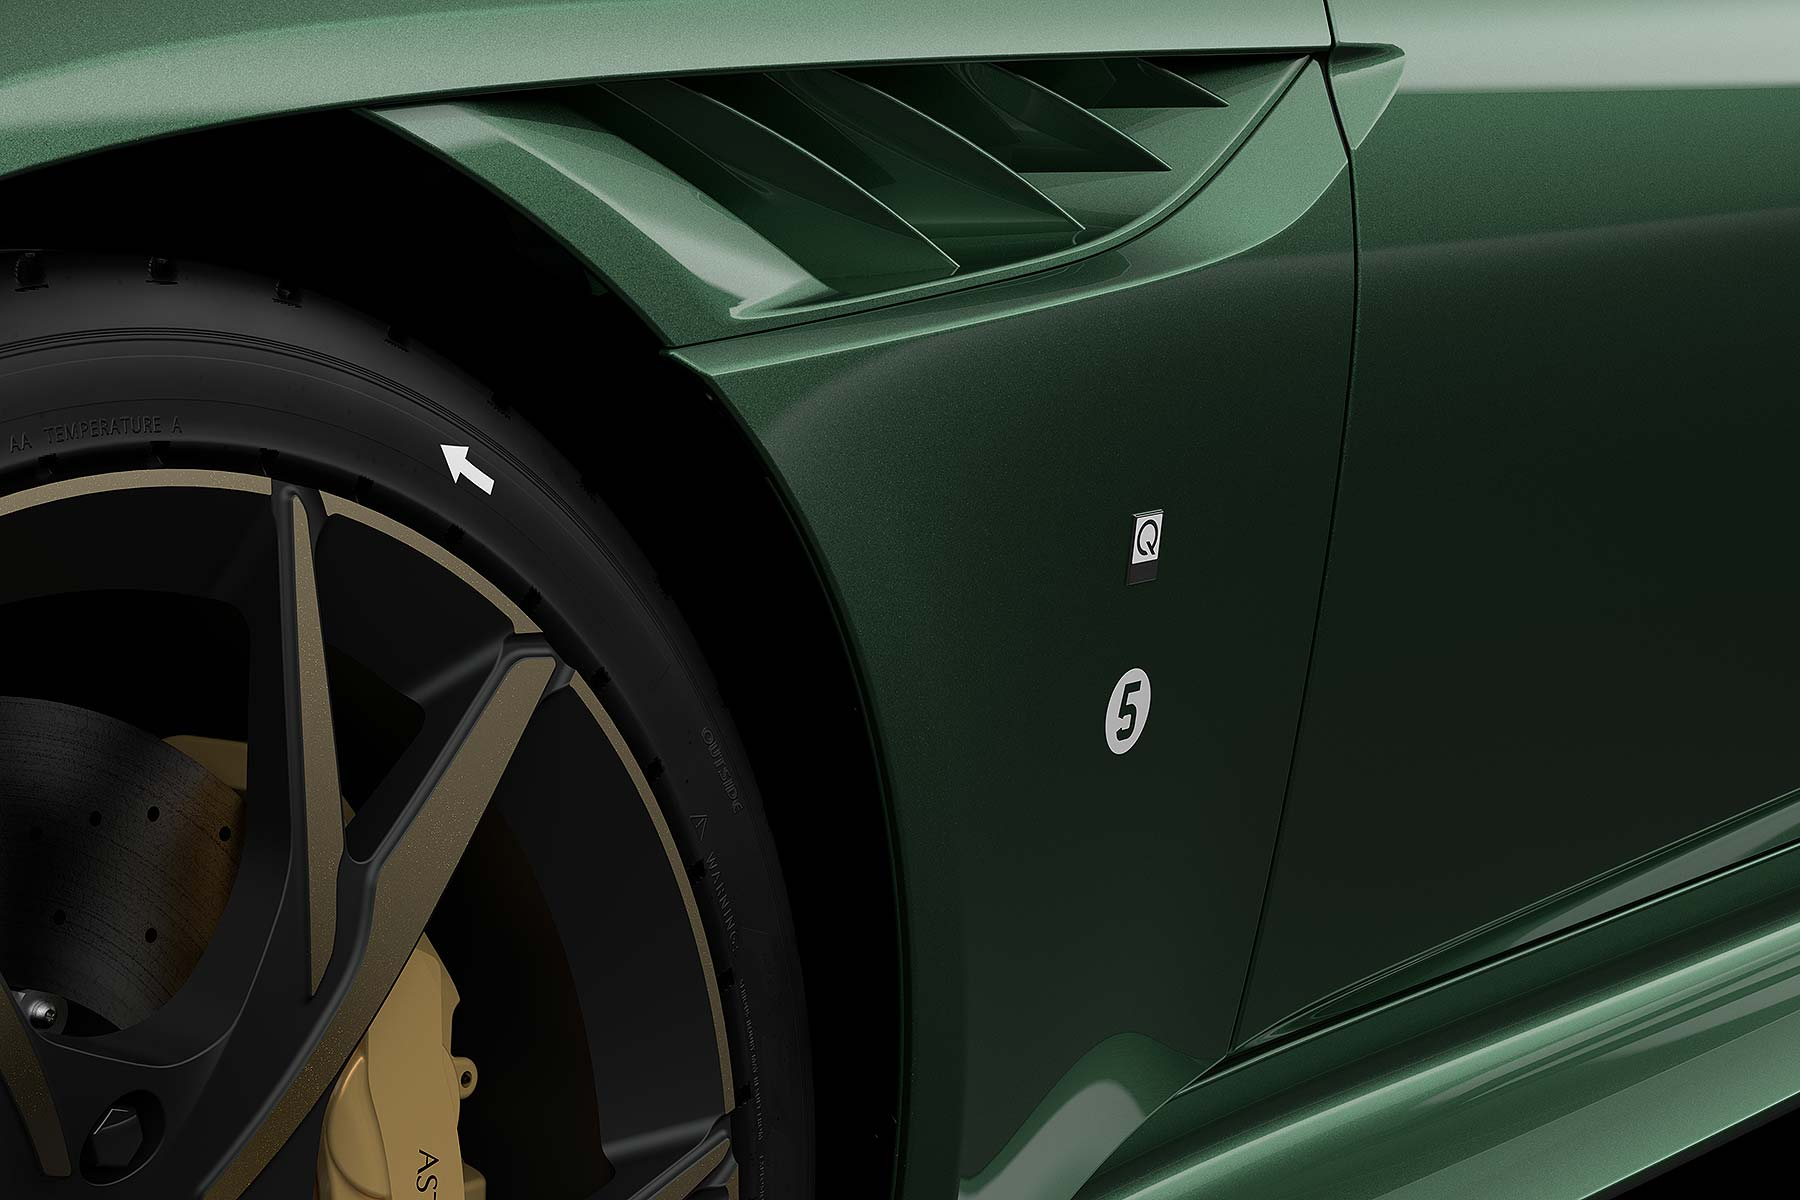 Aston Martin DBS Superleggera 'Q by Aston Martin Commission'